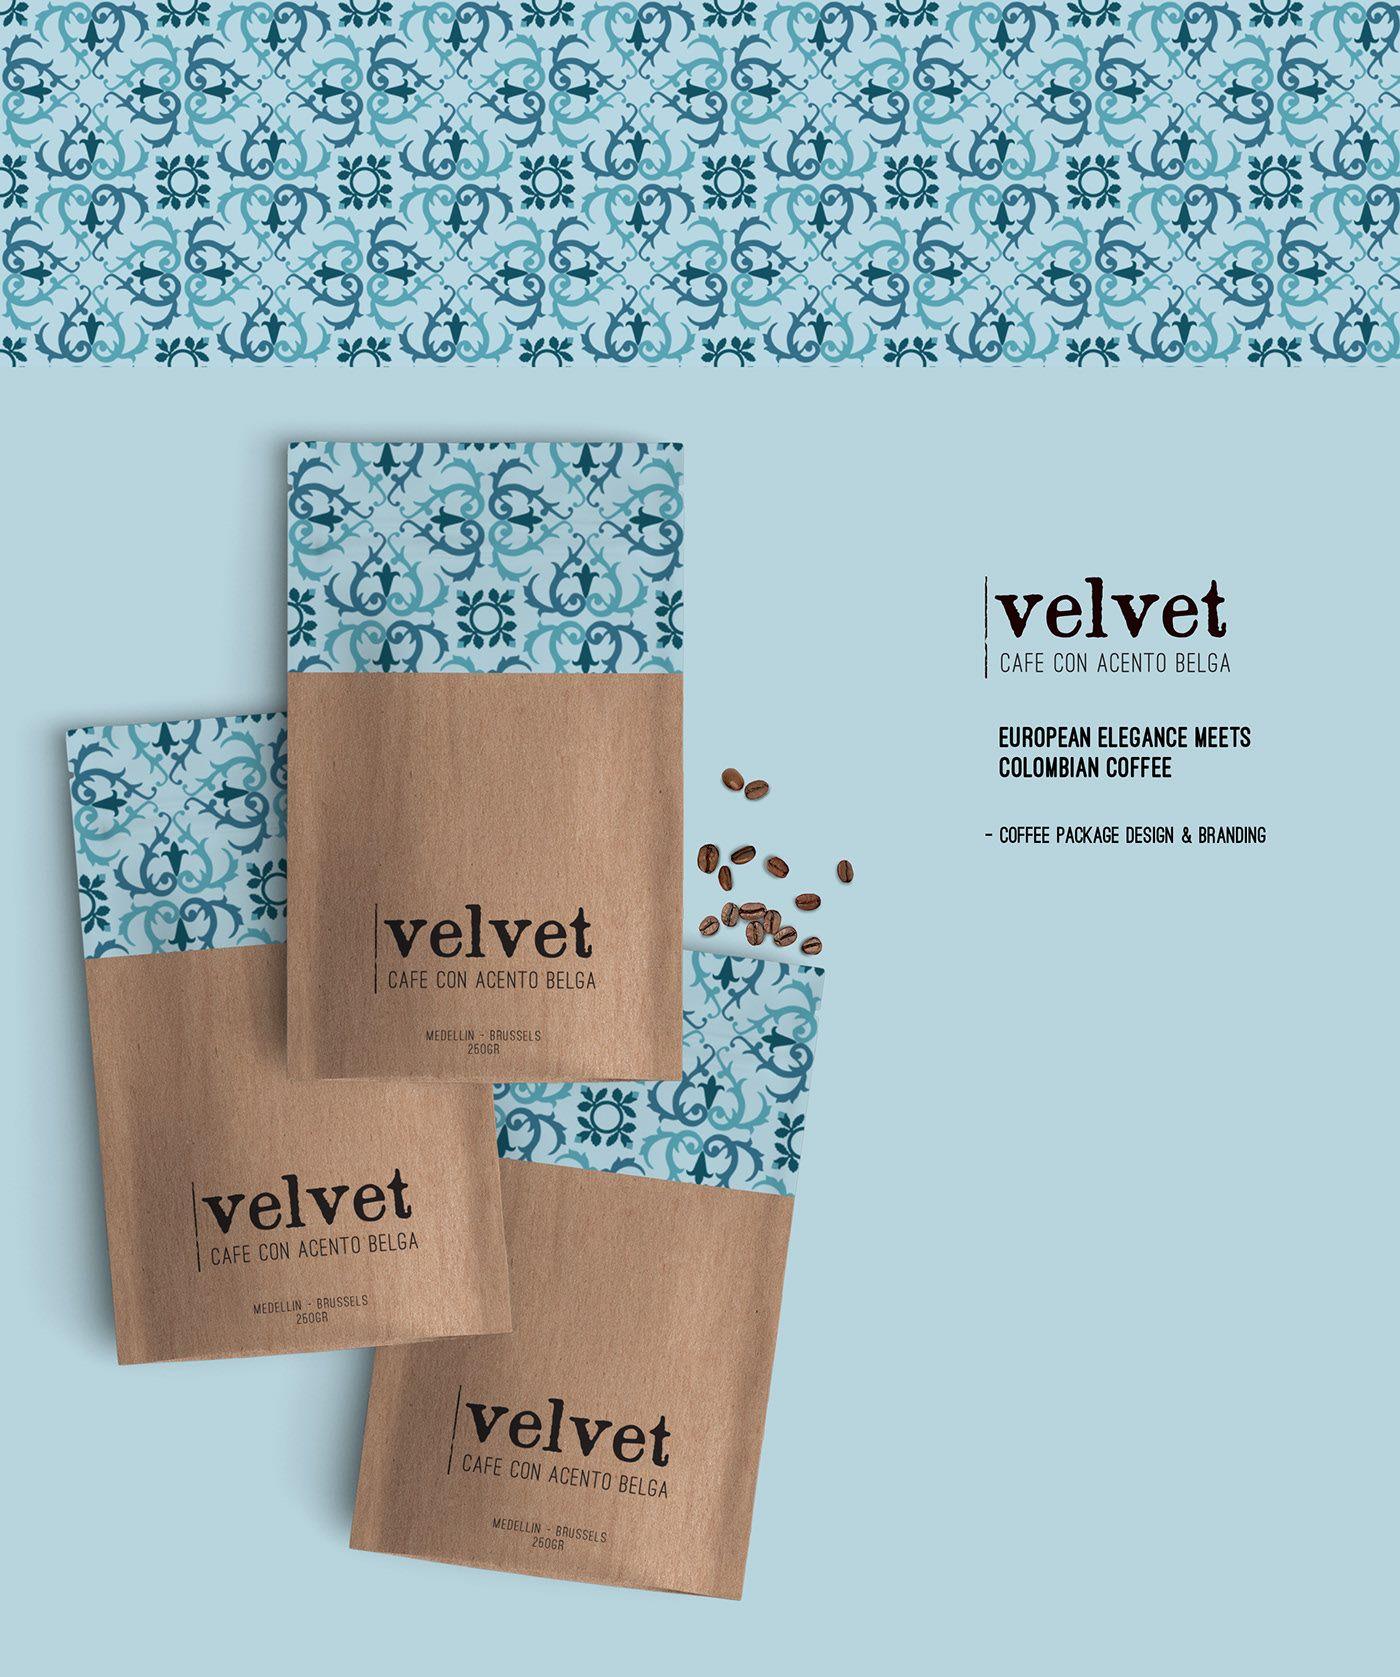 Velvet Coffee Bags Package Design & Branding on Behance #teapackaging